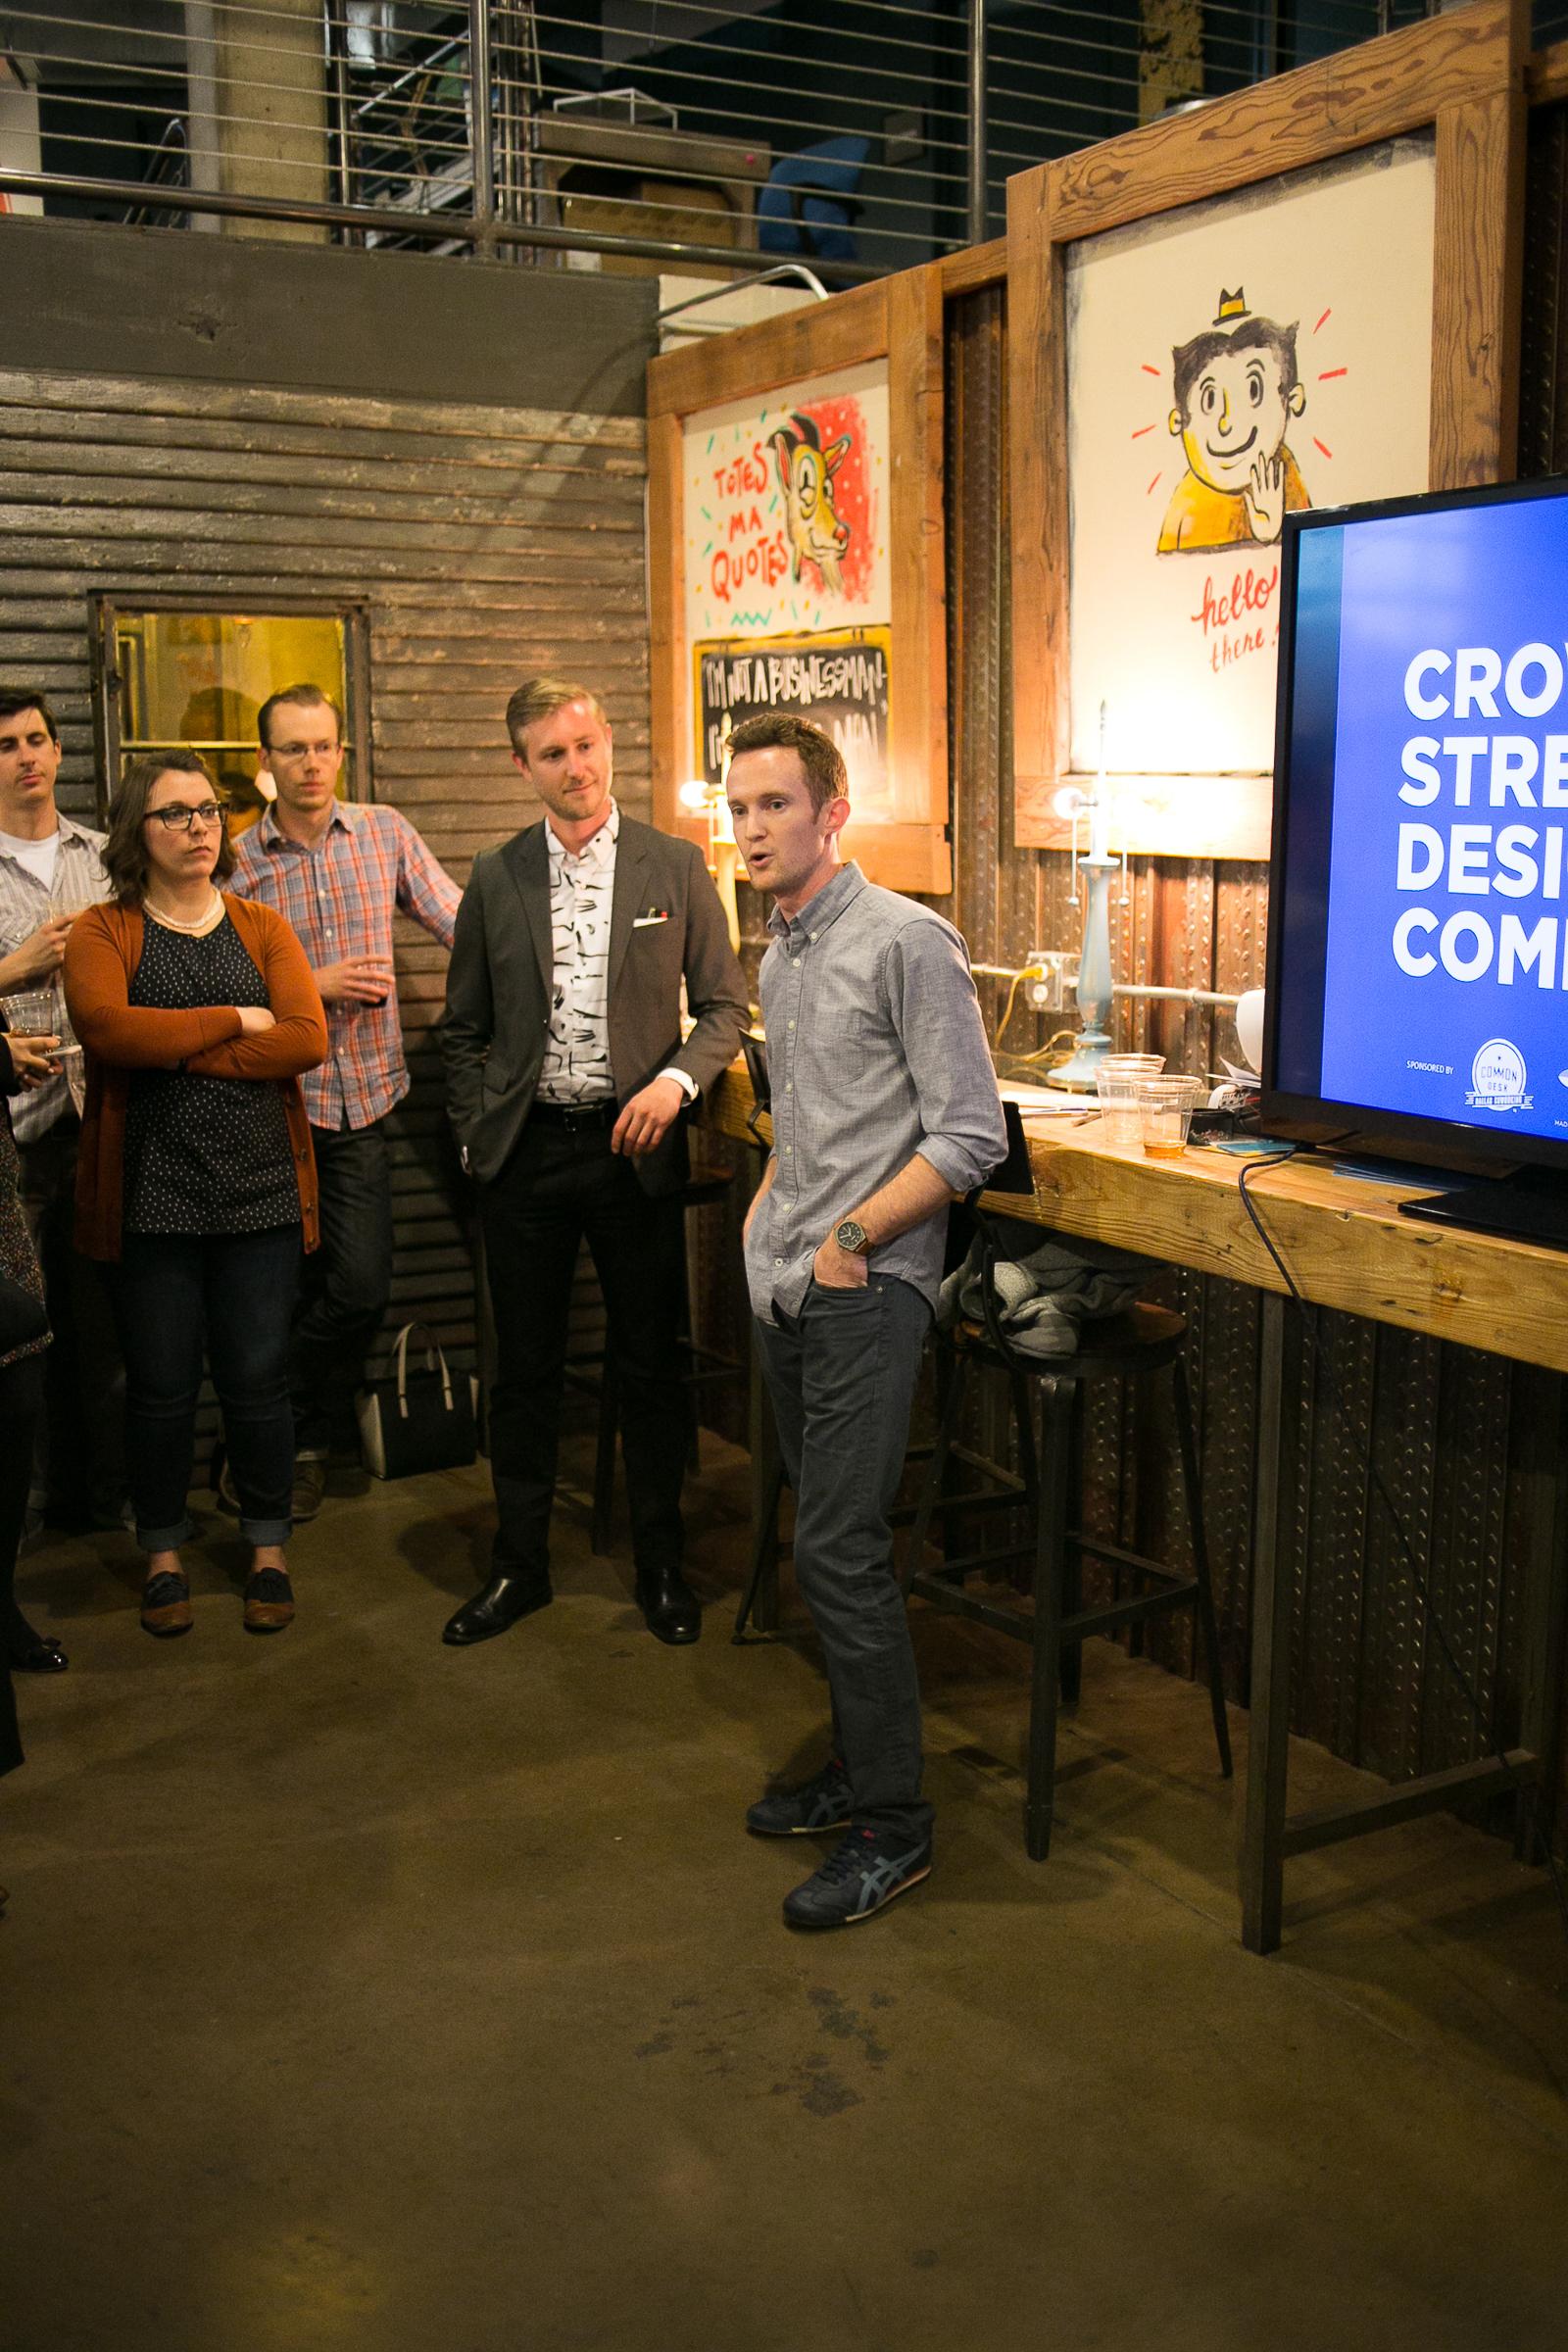 CrowdusStreetCompetition-48.JPG